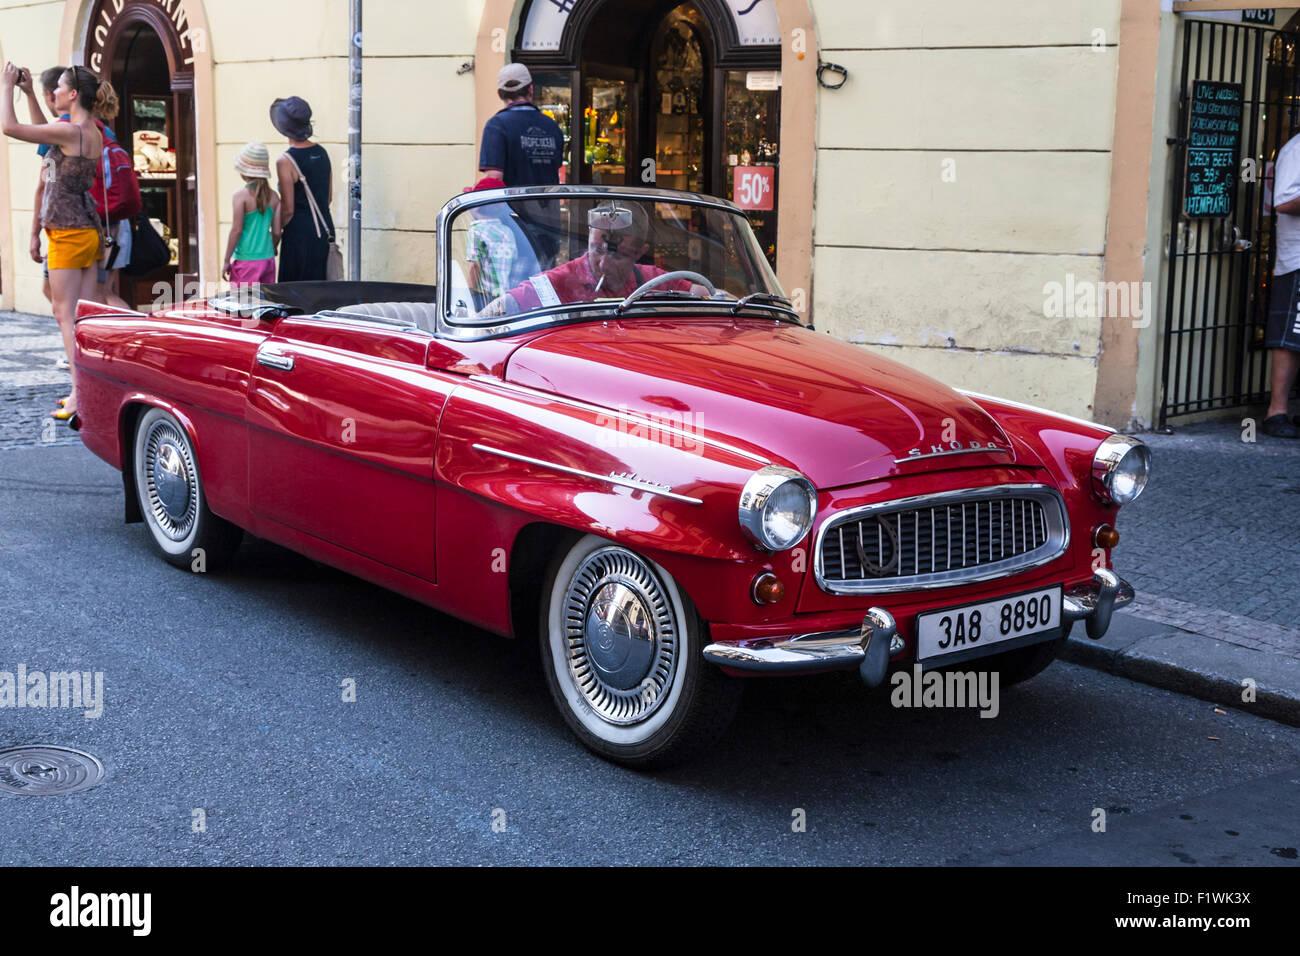 Old Red Skoda Felicia convertible on a Prague street, Czech Republic. - Stock Image